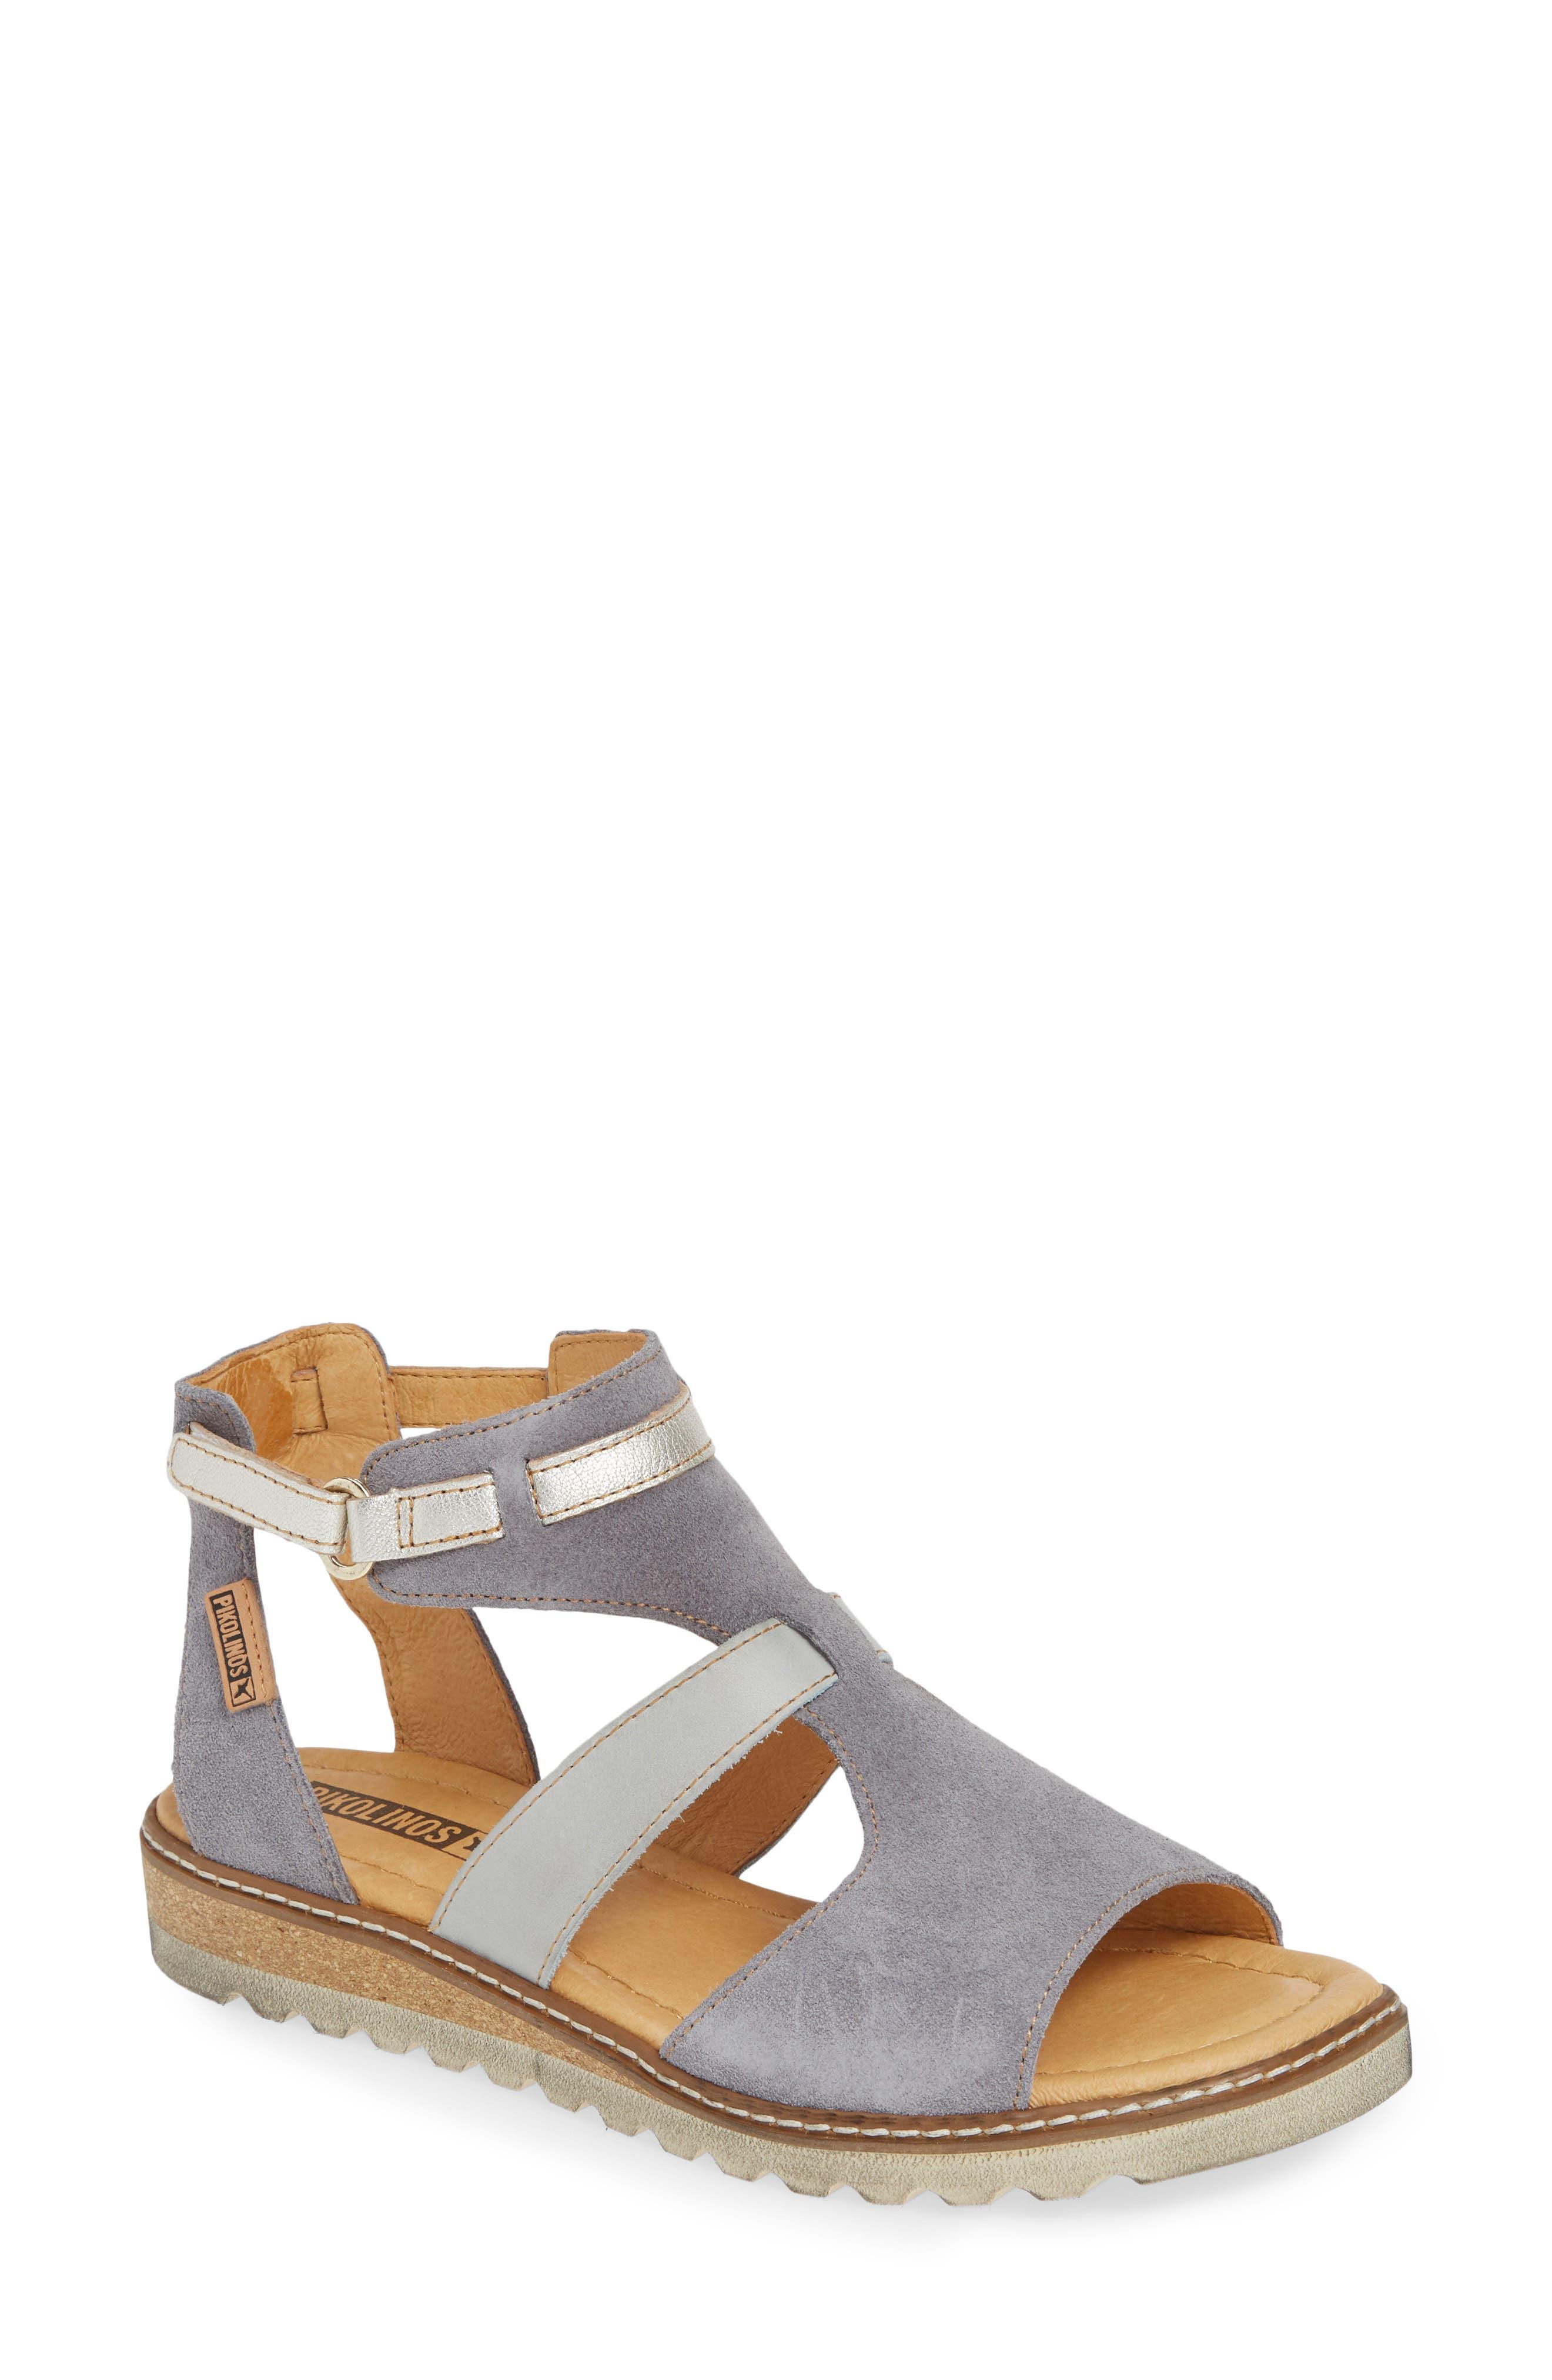 Pikolinos Alcudia Multiband Sandal, Blue